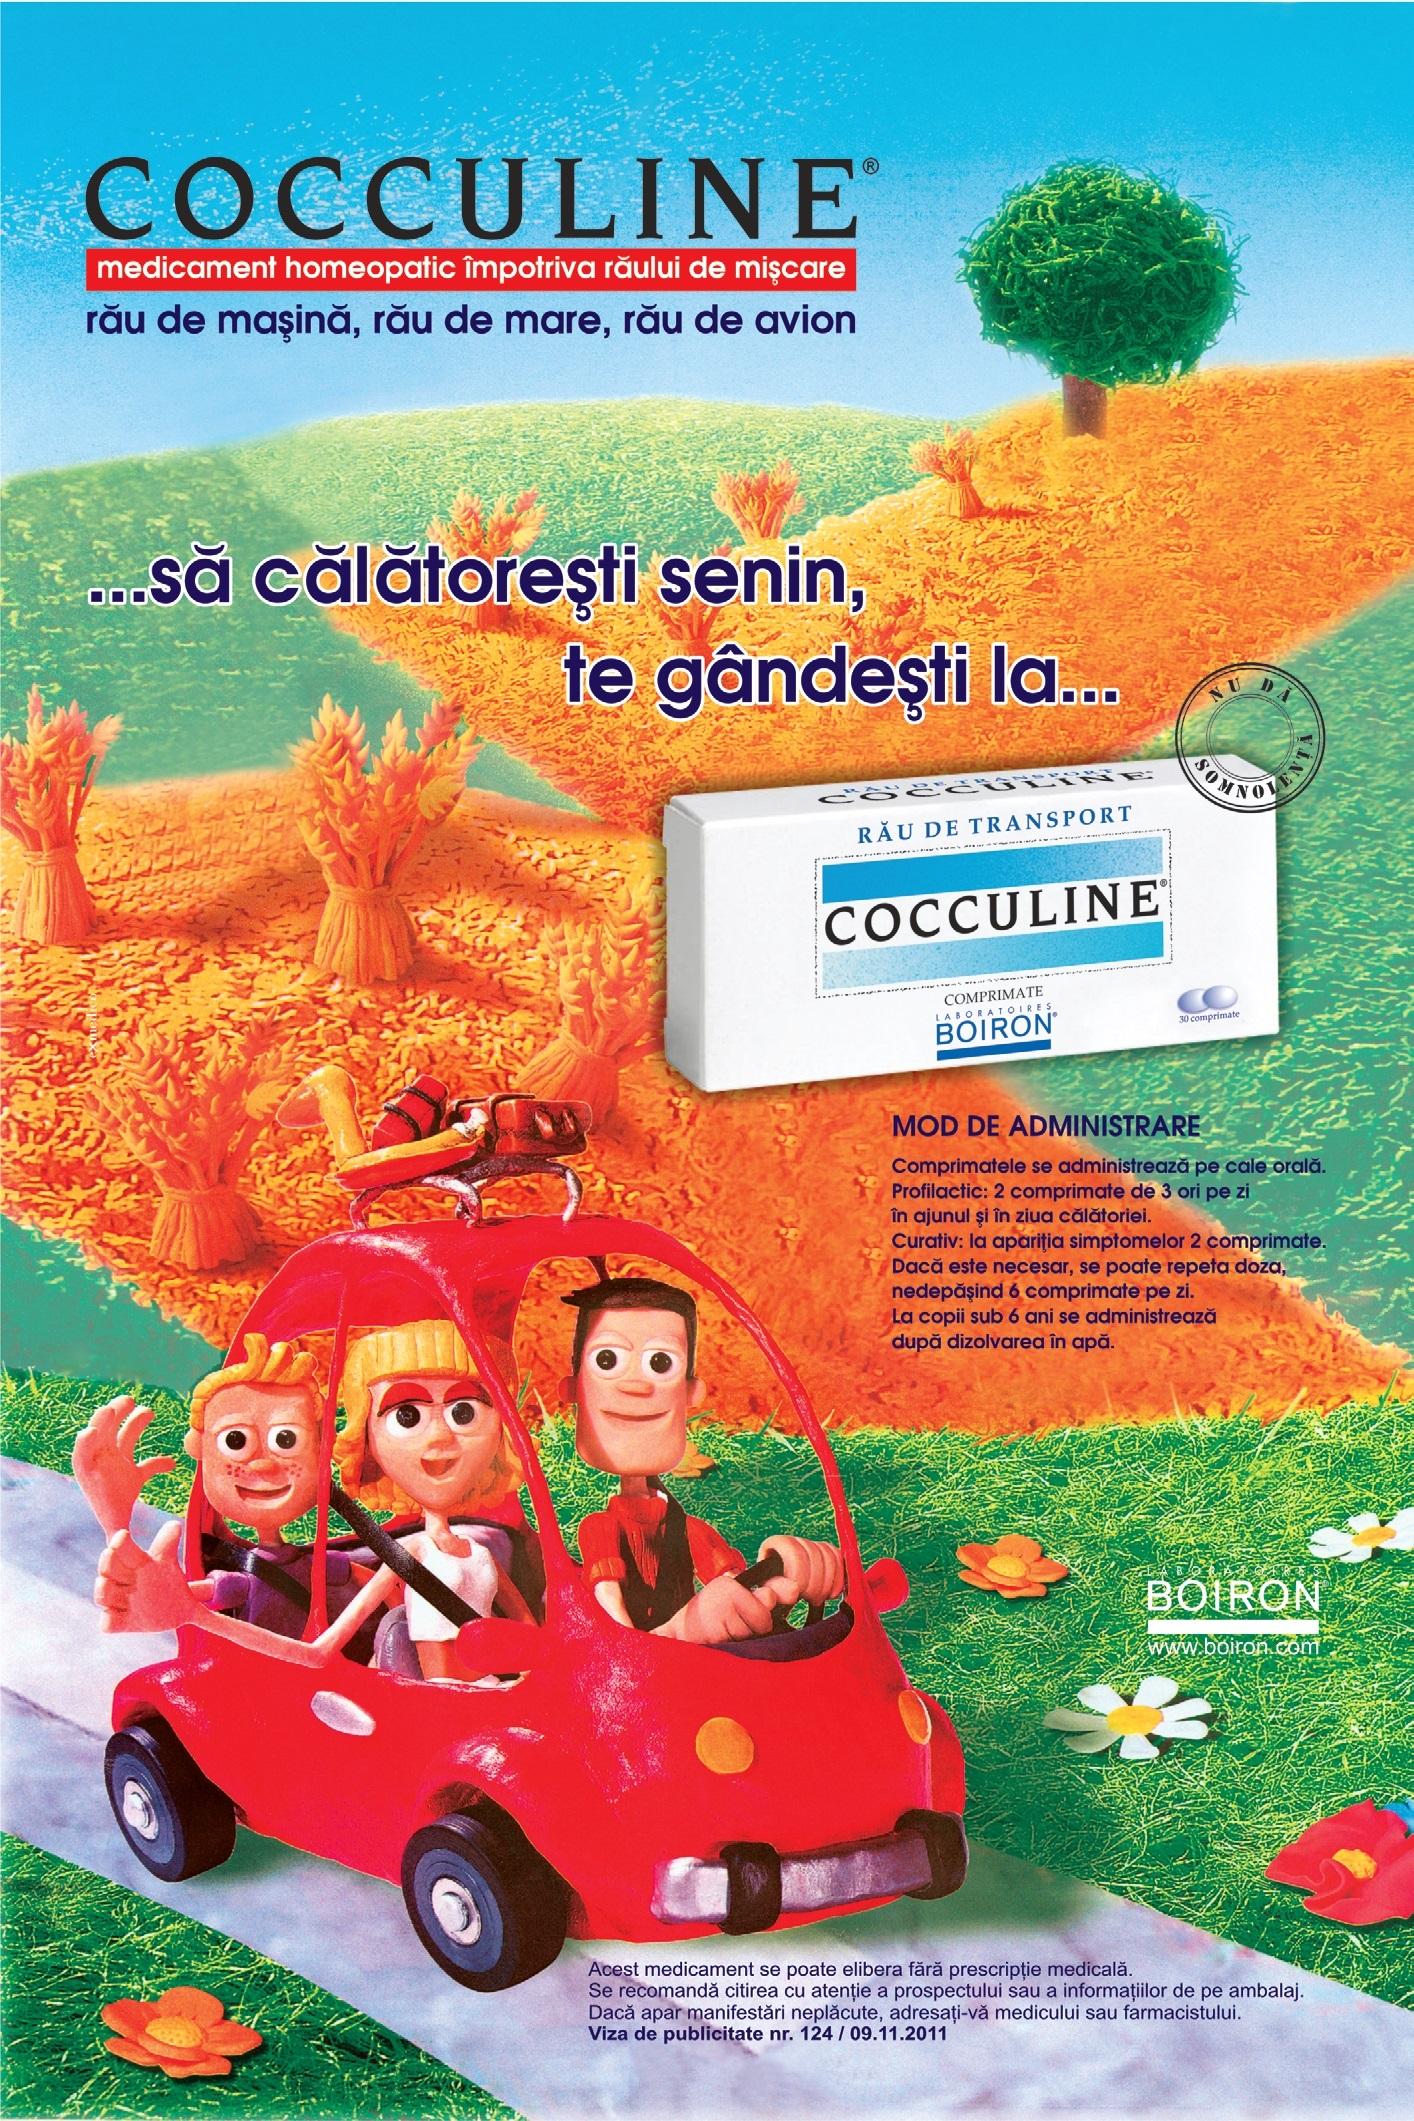 cocculine - boiron